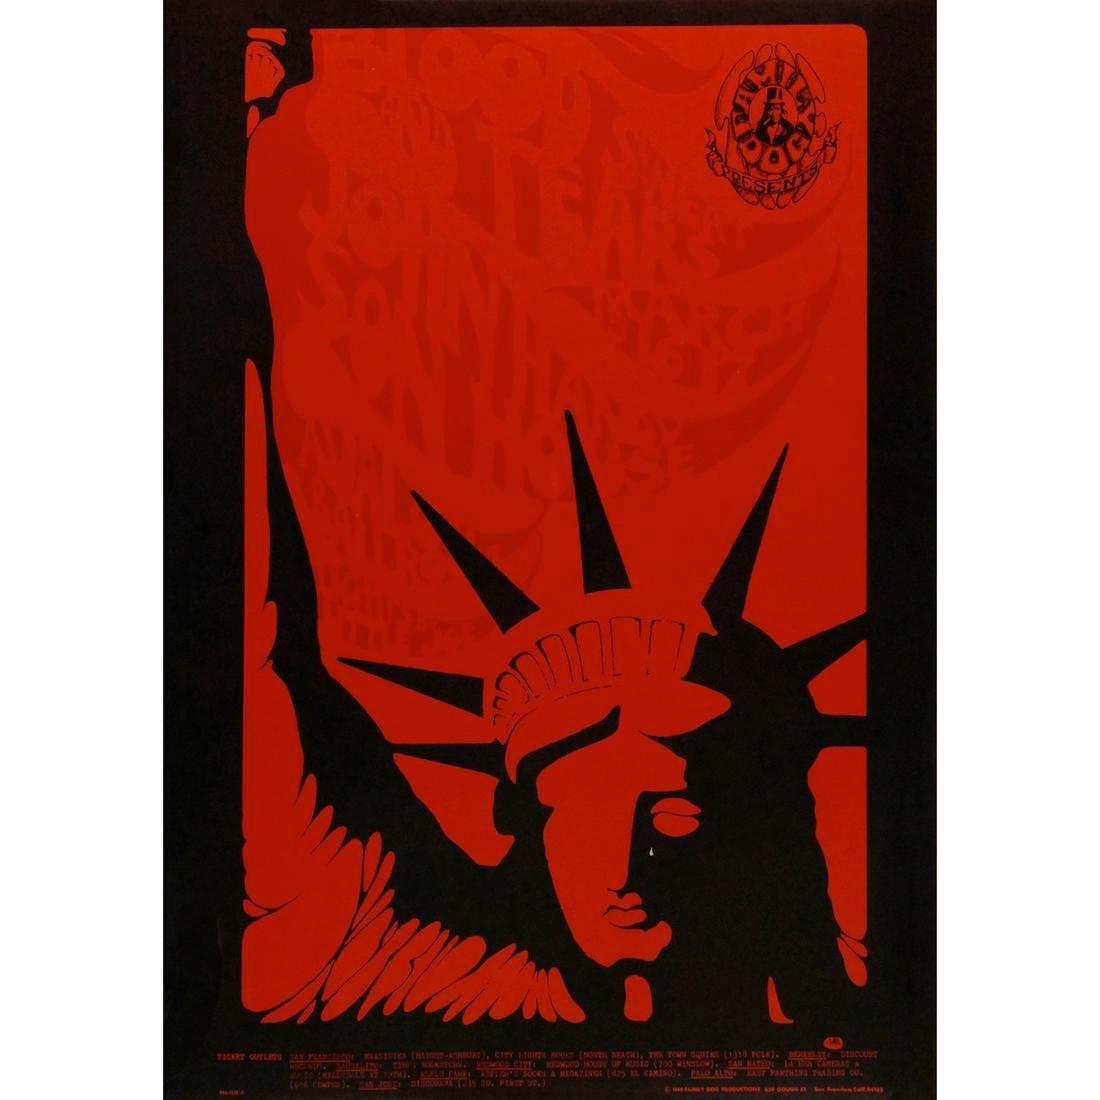 Blood, Sweat & Tears - 1968 FD Concert Poster